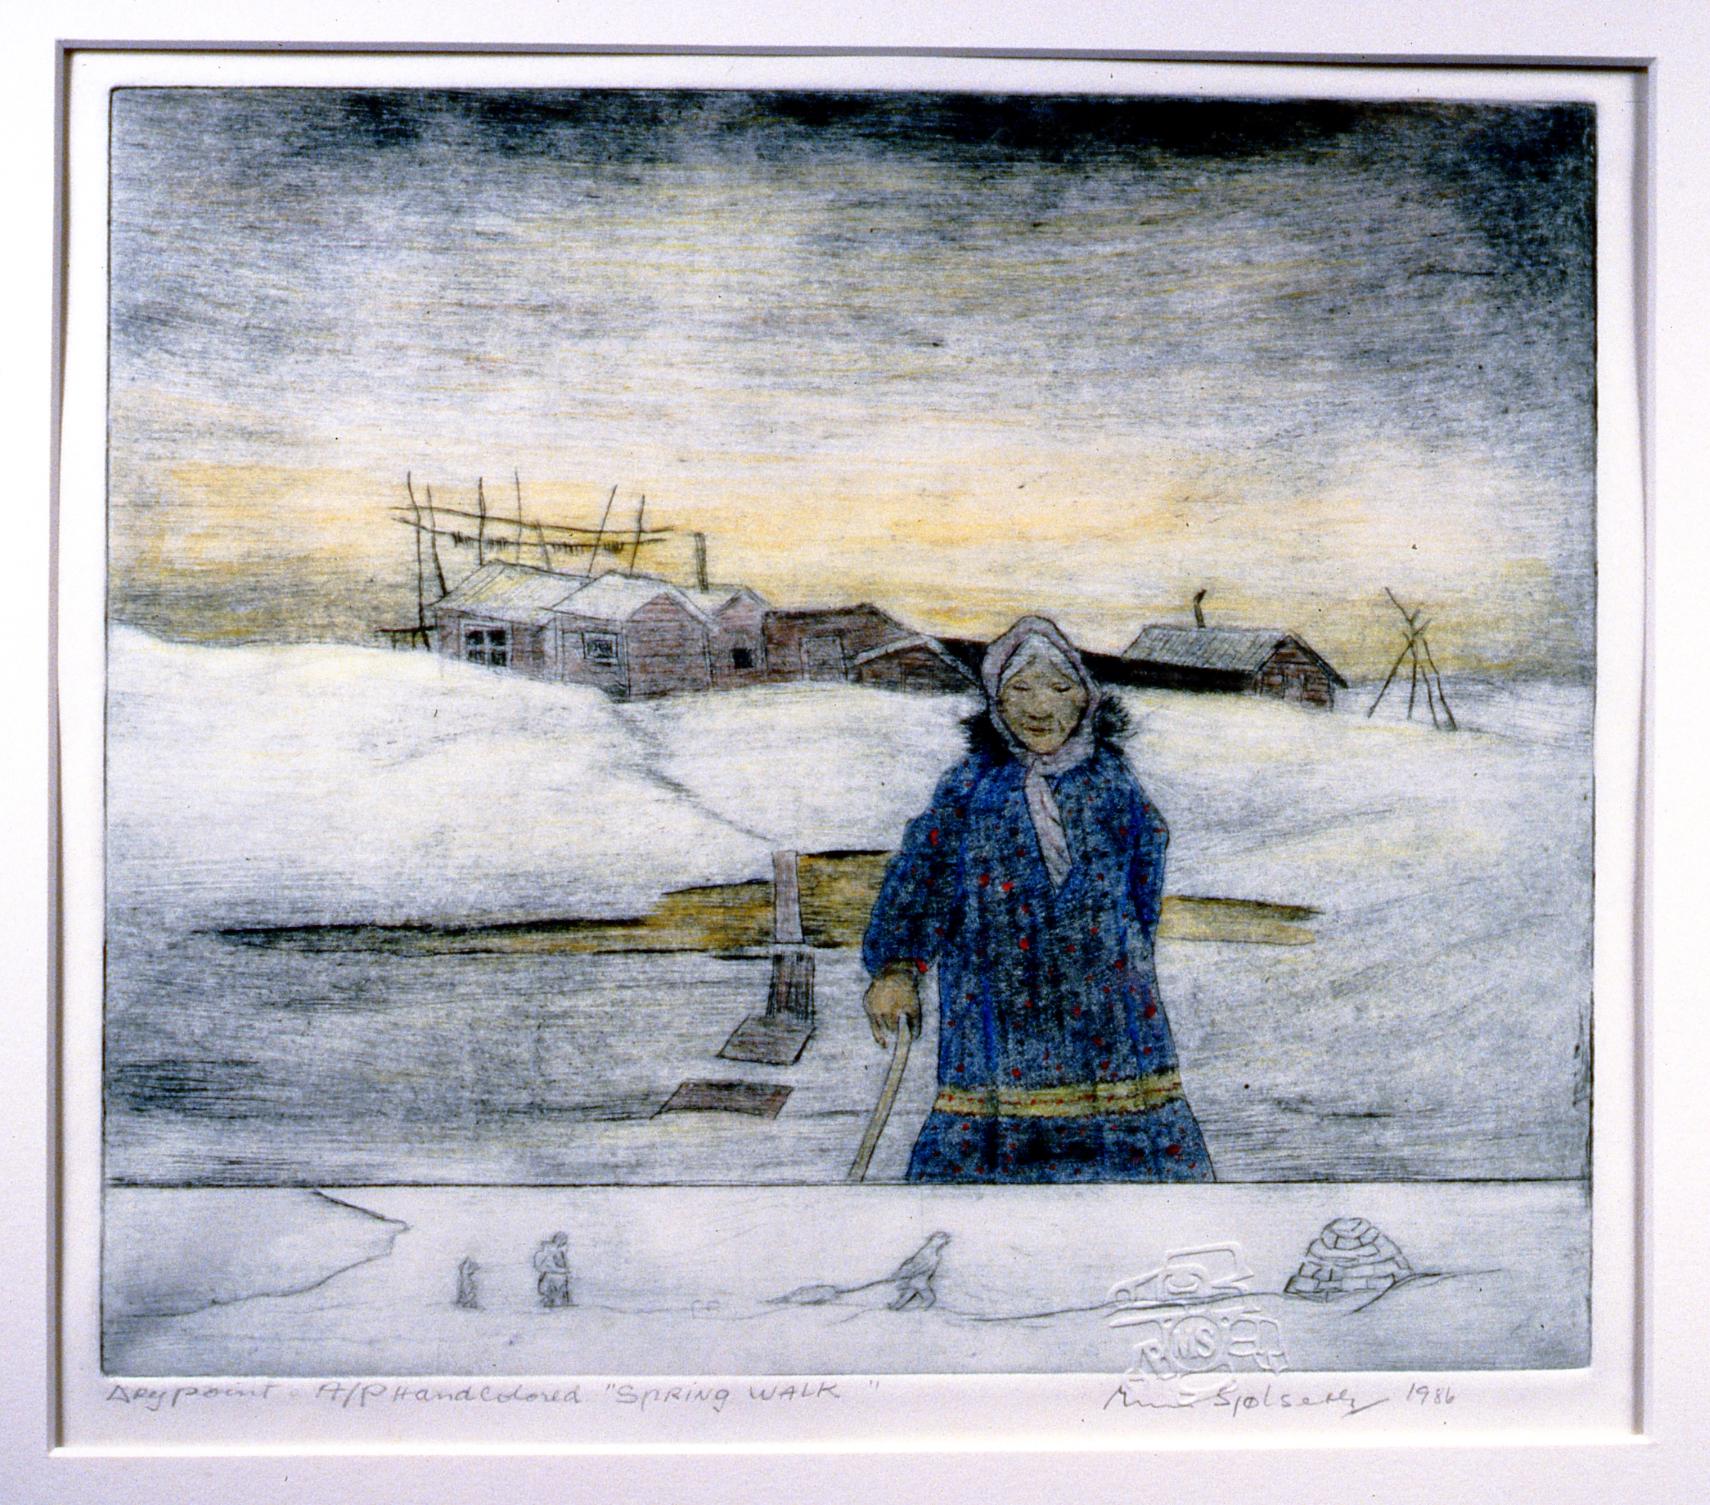 Spring Walk , 1986, Minn Sjølseth, hand-coloured dry point, 21.5 x 25.5 cm, 1996.02.25